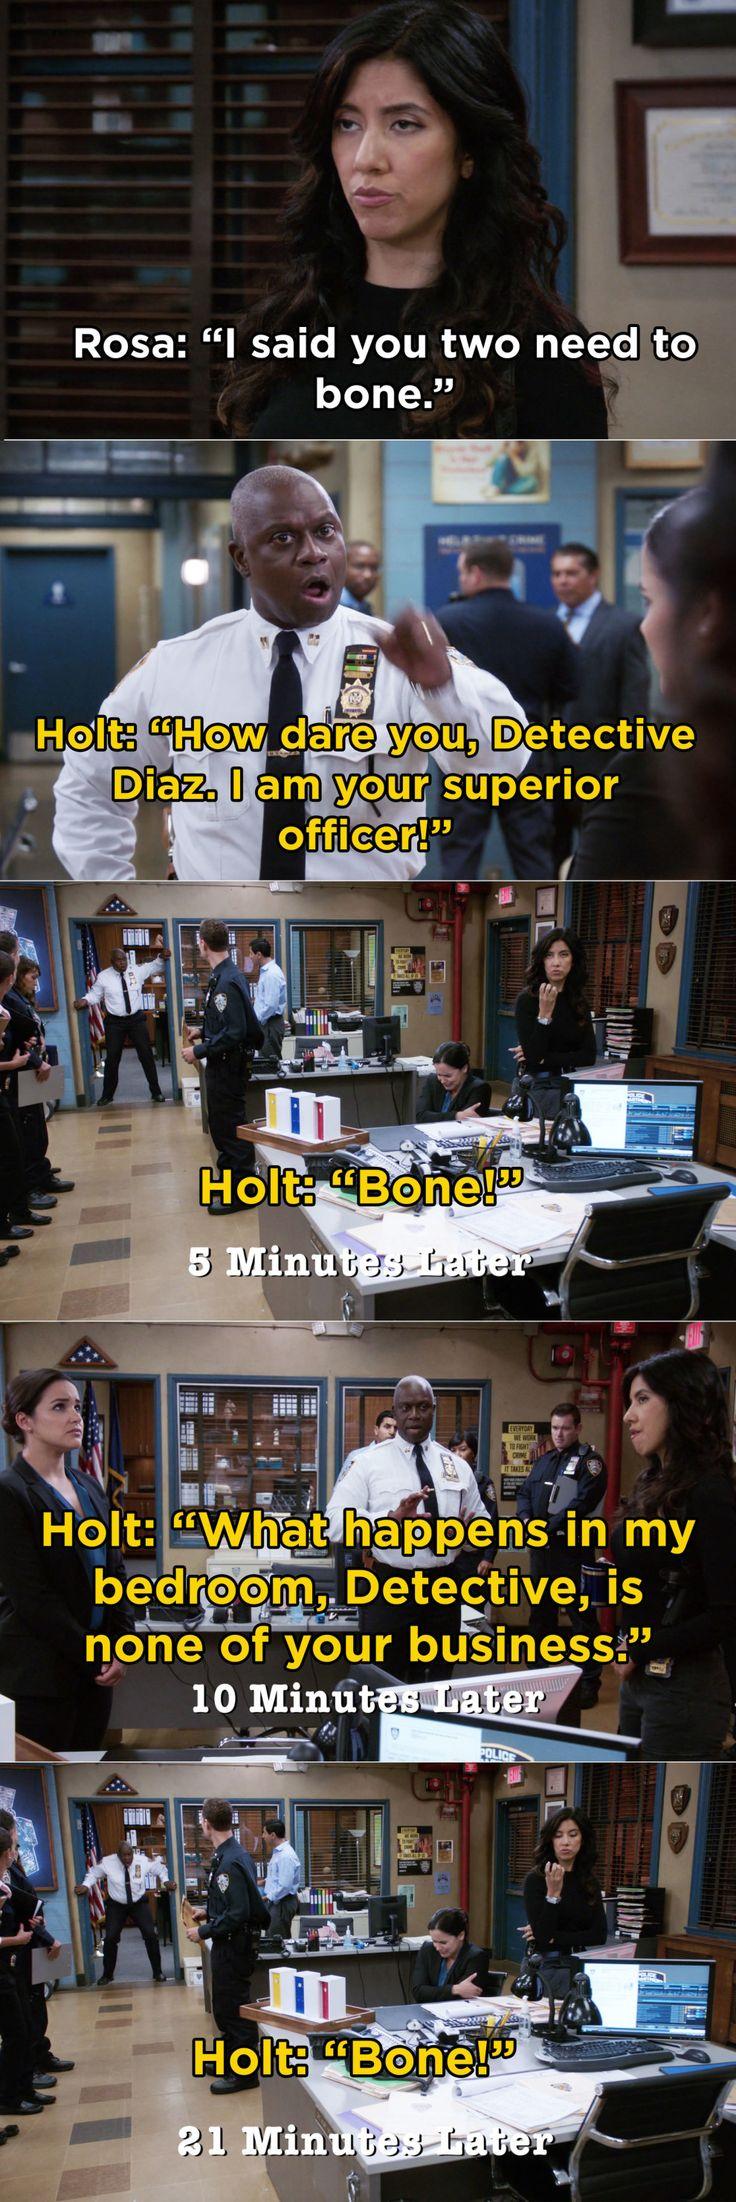 Brooklyn Nine-Nine: 18 Captain Holt Memes Proving He's The Greatest